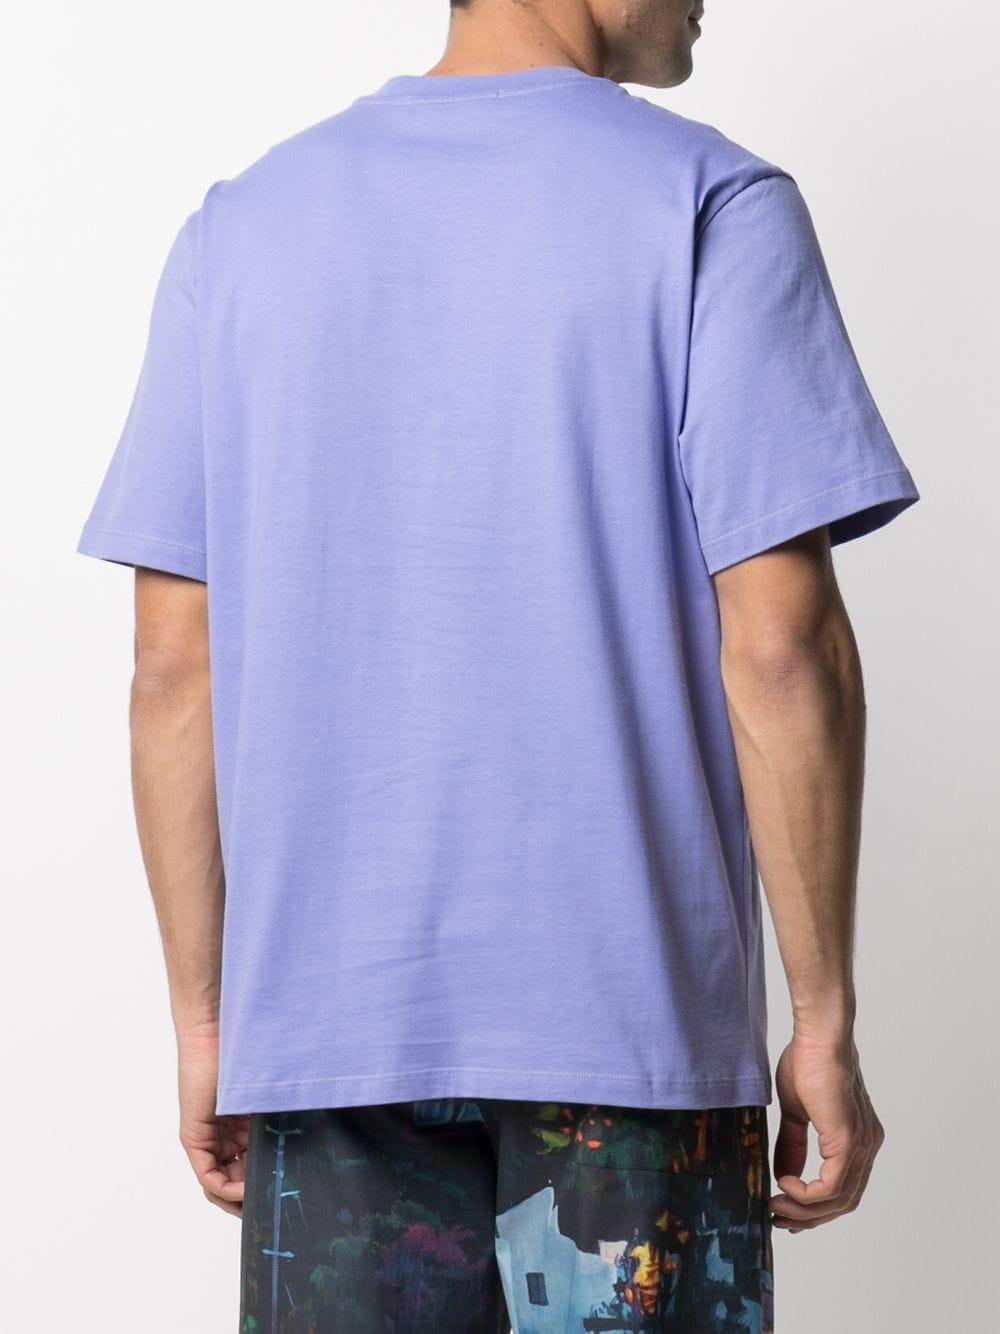 Msgm t-shirt in cotone con logo uomo MSGM | T-shirt | 3040MM169 21709872